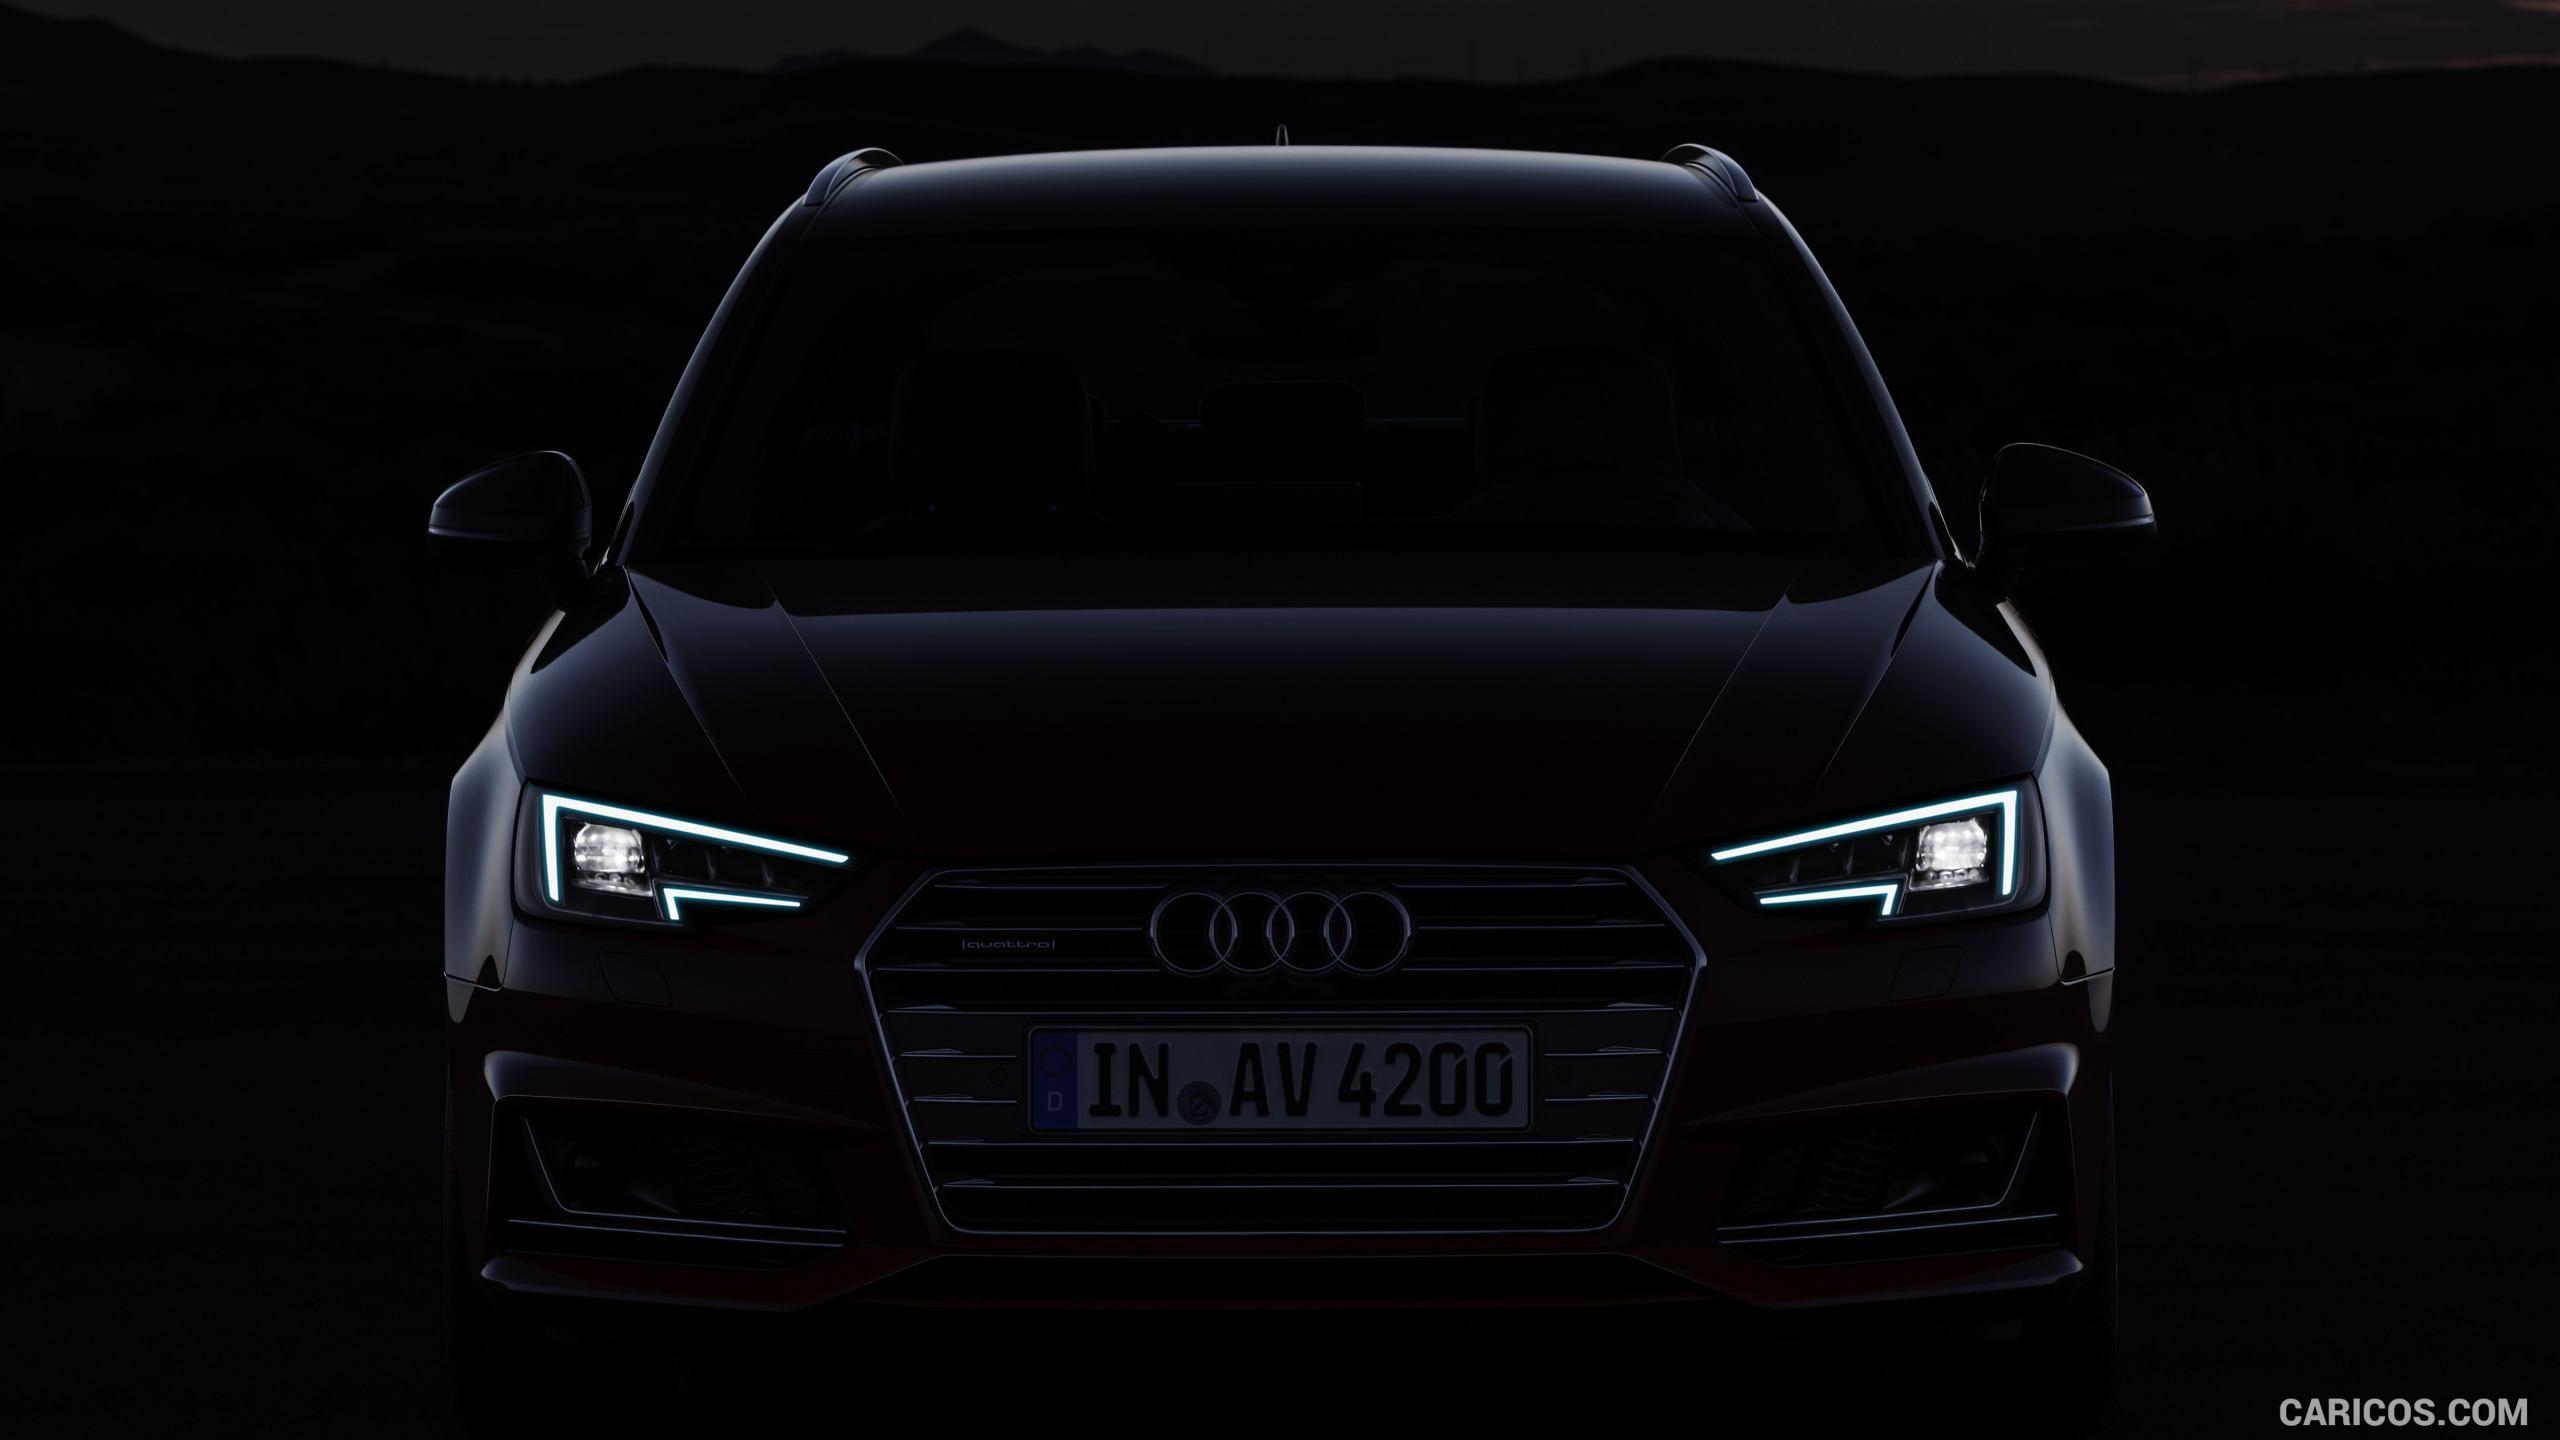 Next Stop Pinterest Audi Audi A4 Led Wallpapers